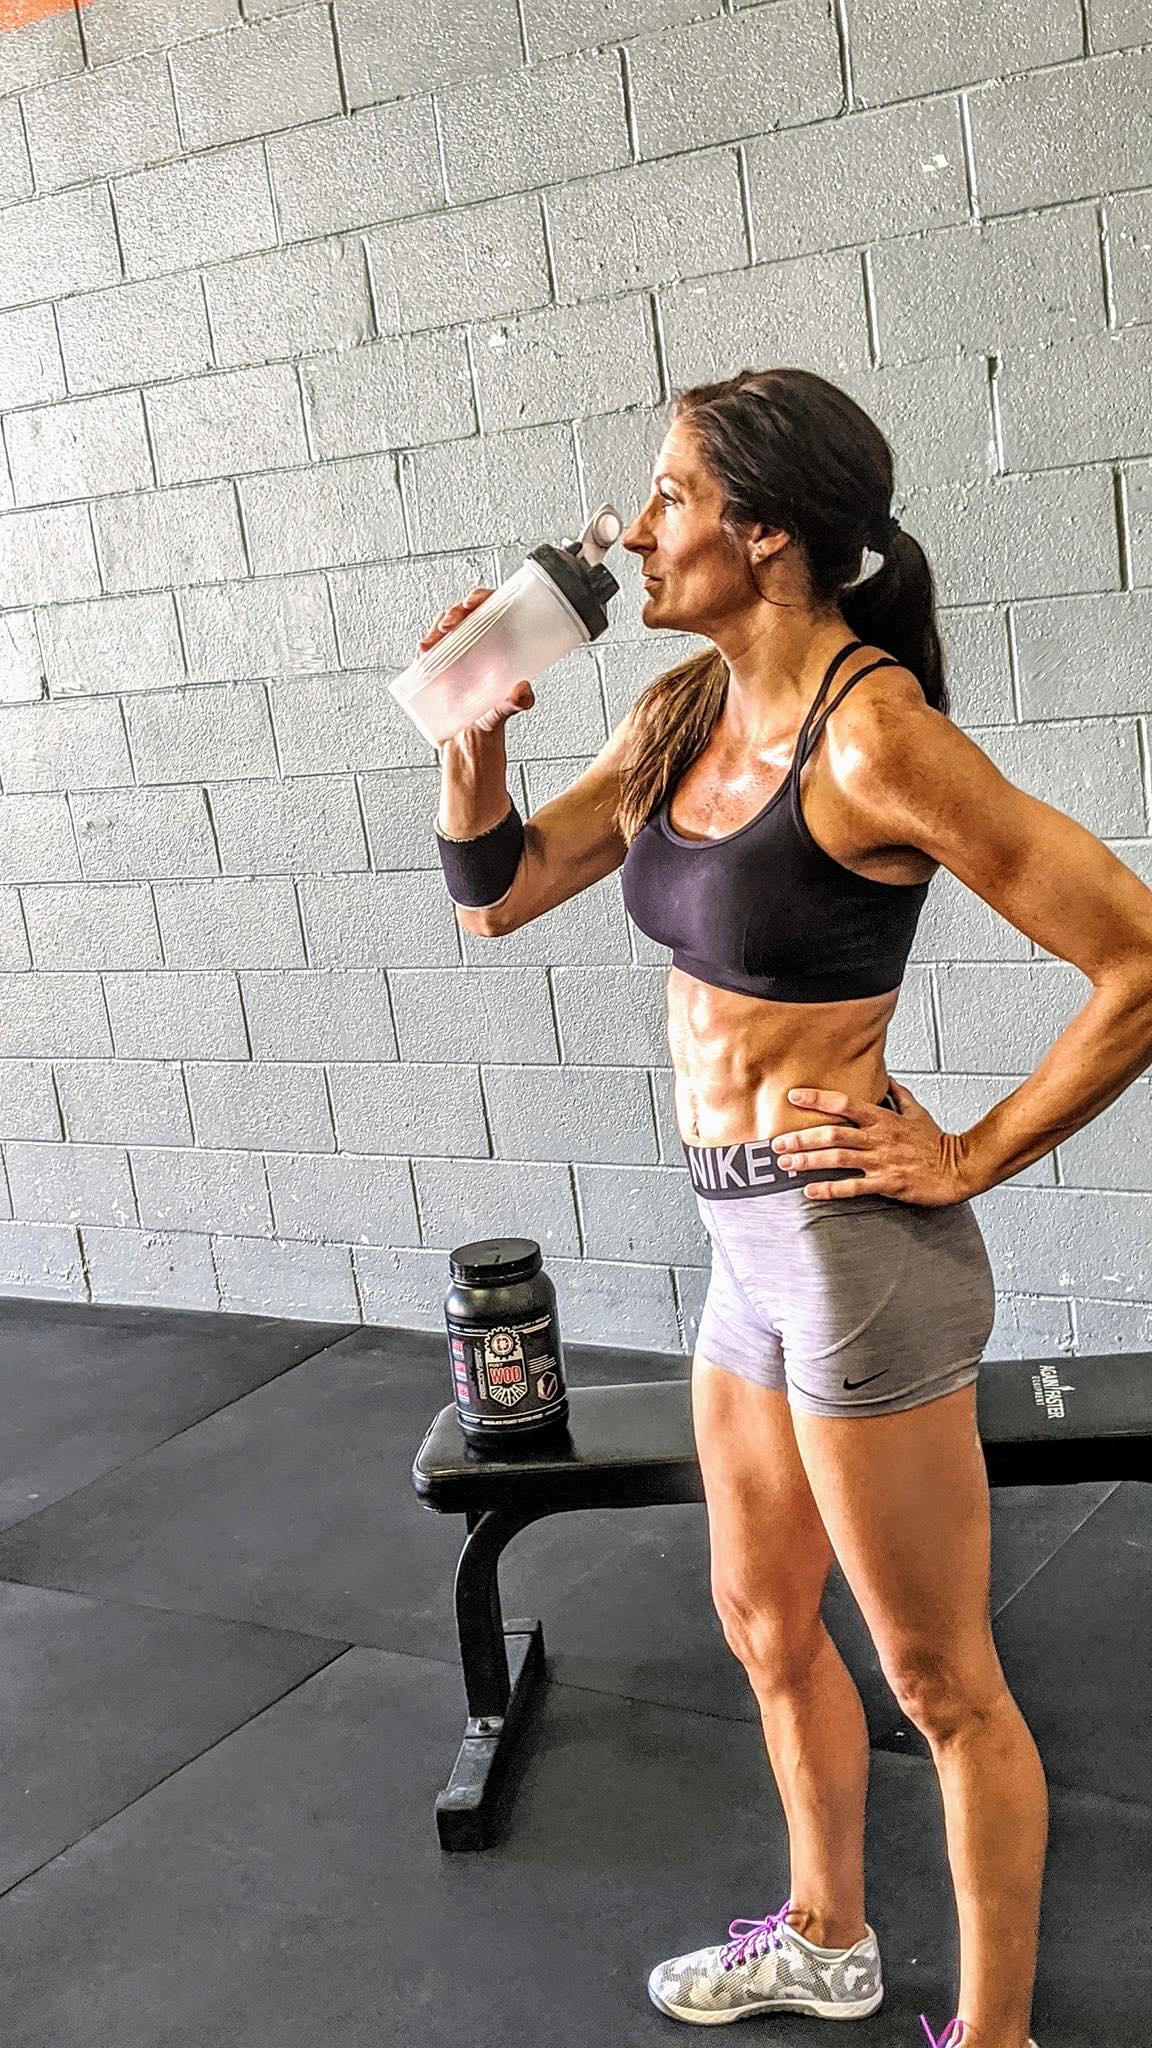 Gym member drinking protein shake